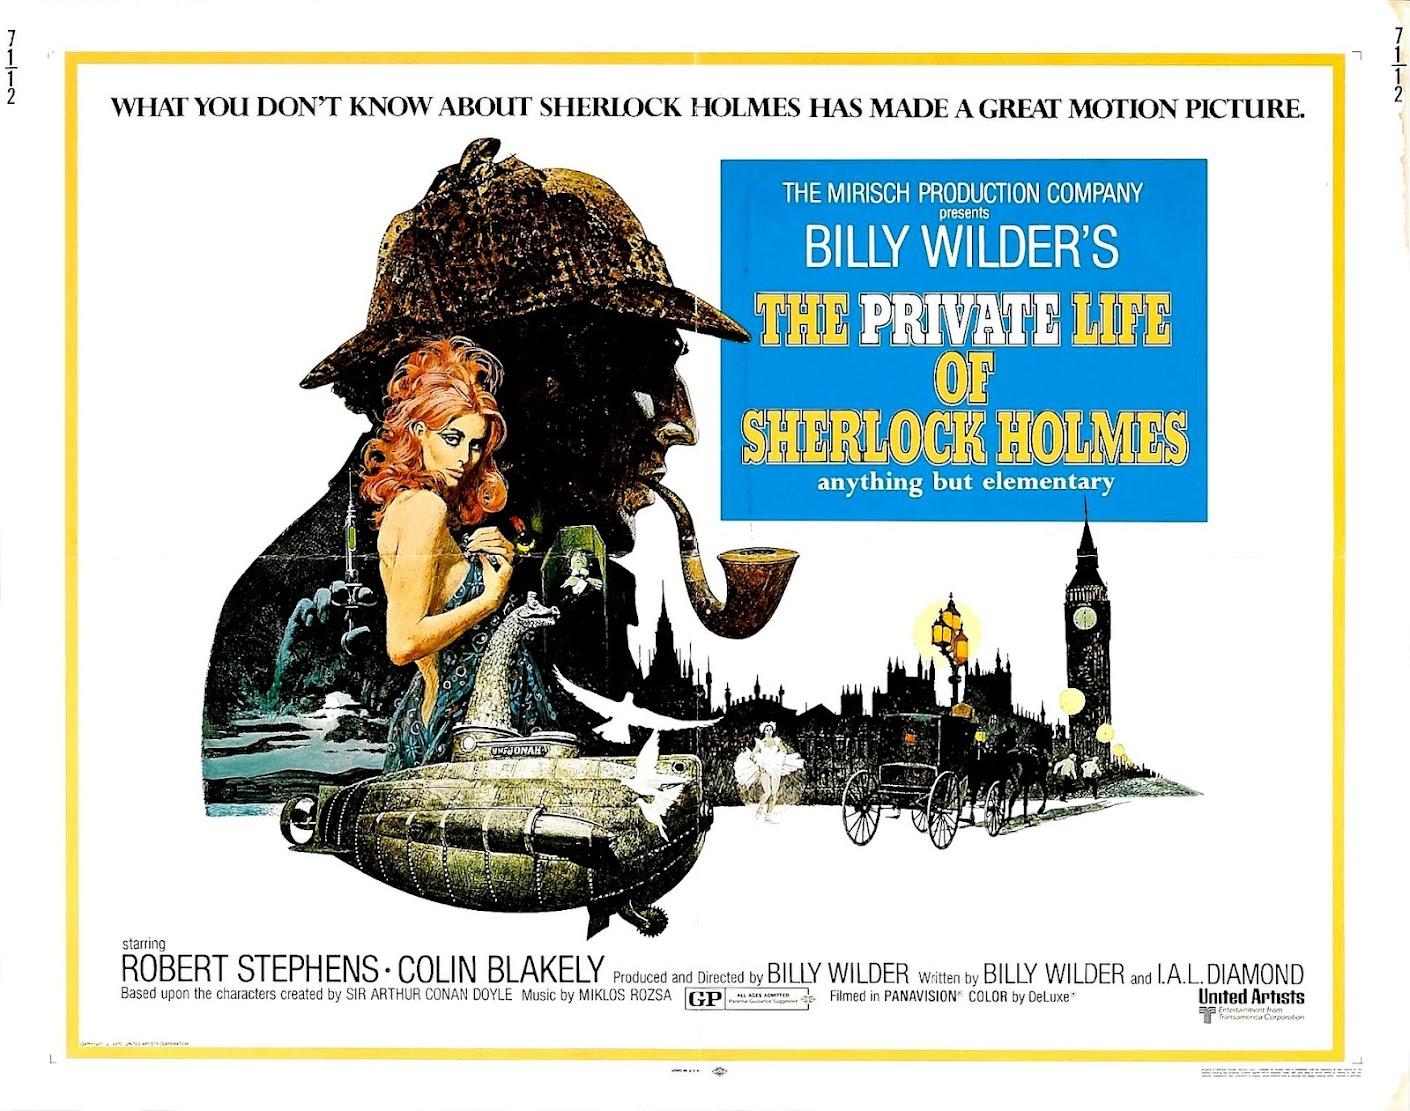 La vie privée de Sherlock Holmes (1969) Billy Wilder - The private life of Sherlock Holmes